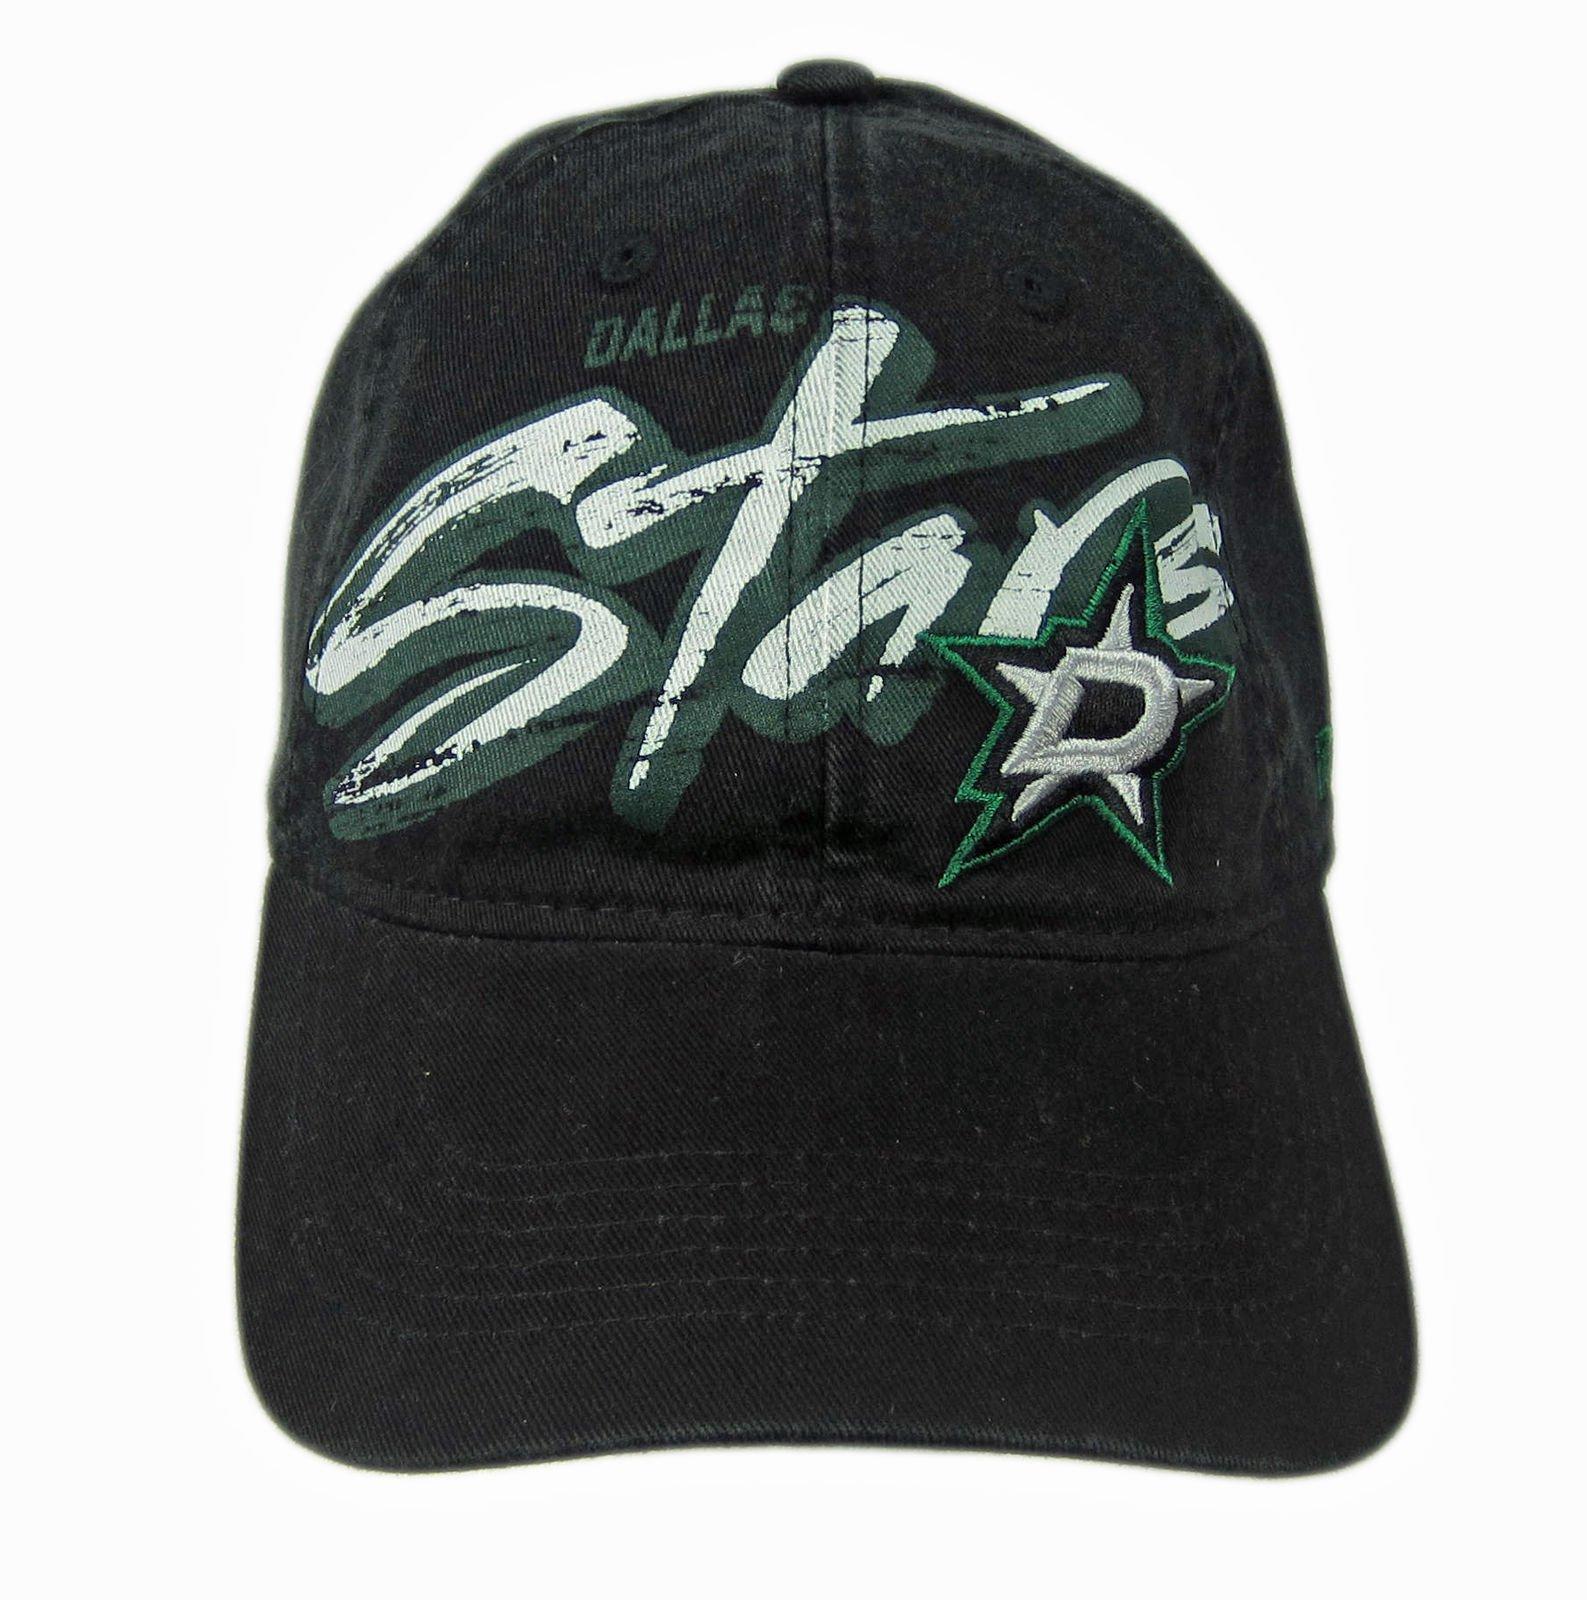 638b316816b Product Details. Reebok Dallas Stars NHL Black Slouch Adjustable Snapback  Hat Cap 100% Cotton ...